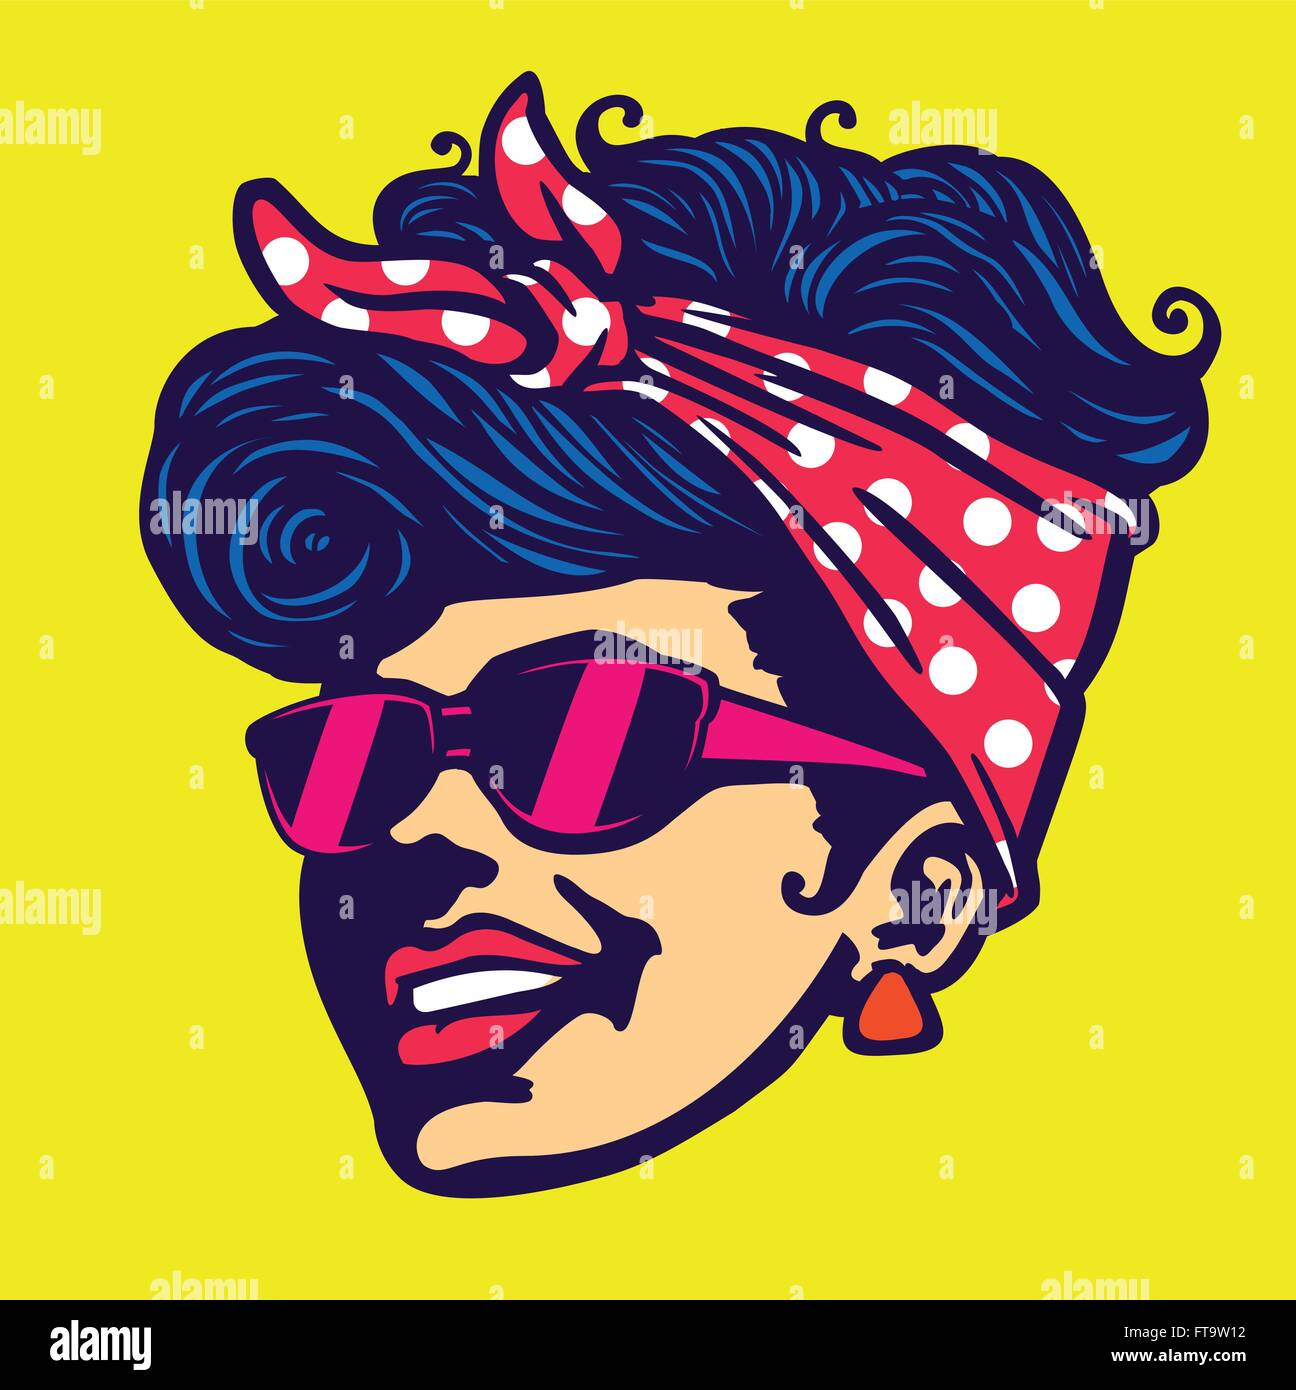 Vintage Retro Cool Girl Face Head Wearing Sunglasses Rockabilly